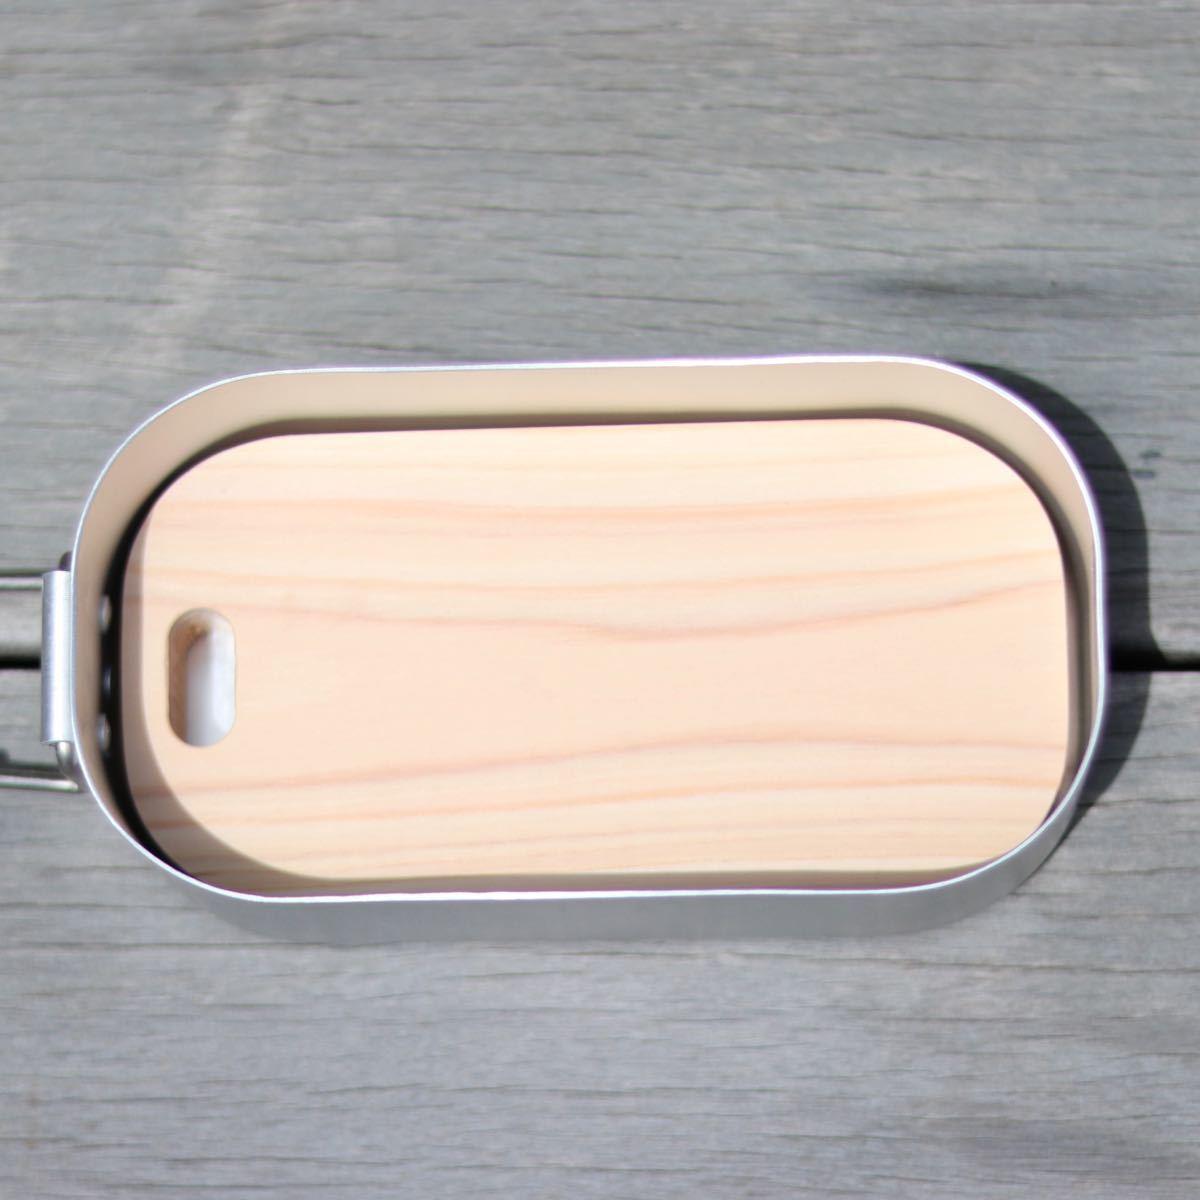 DAISO ダイソー メスティン用 国産ヒノキまな板 ひのき桧